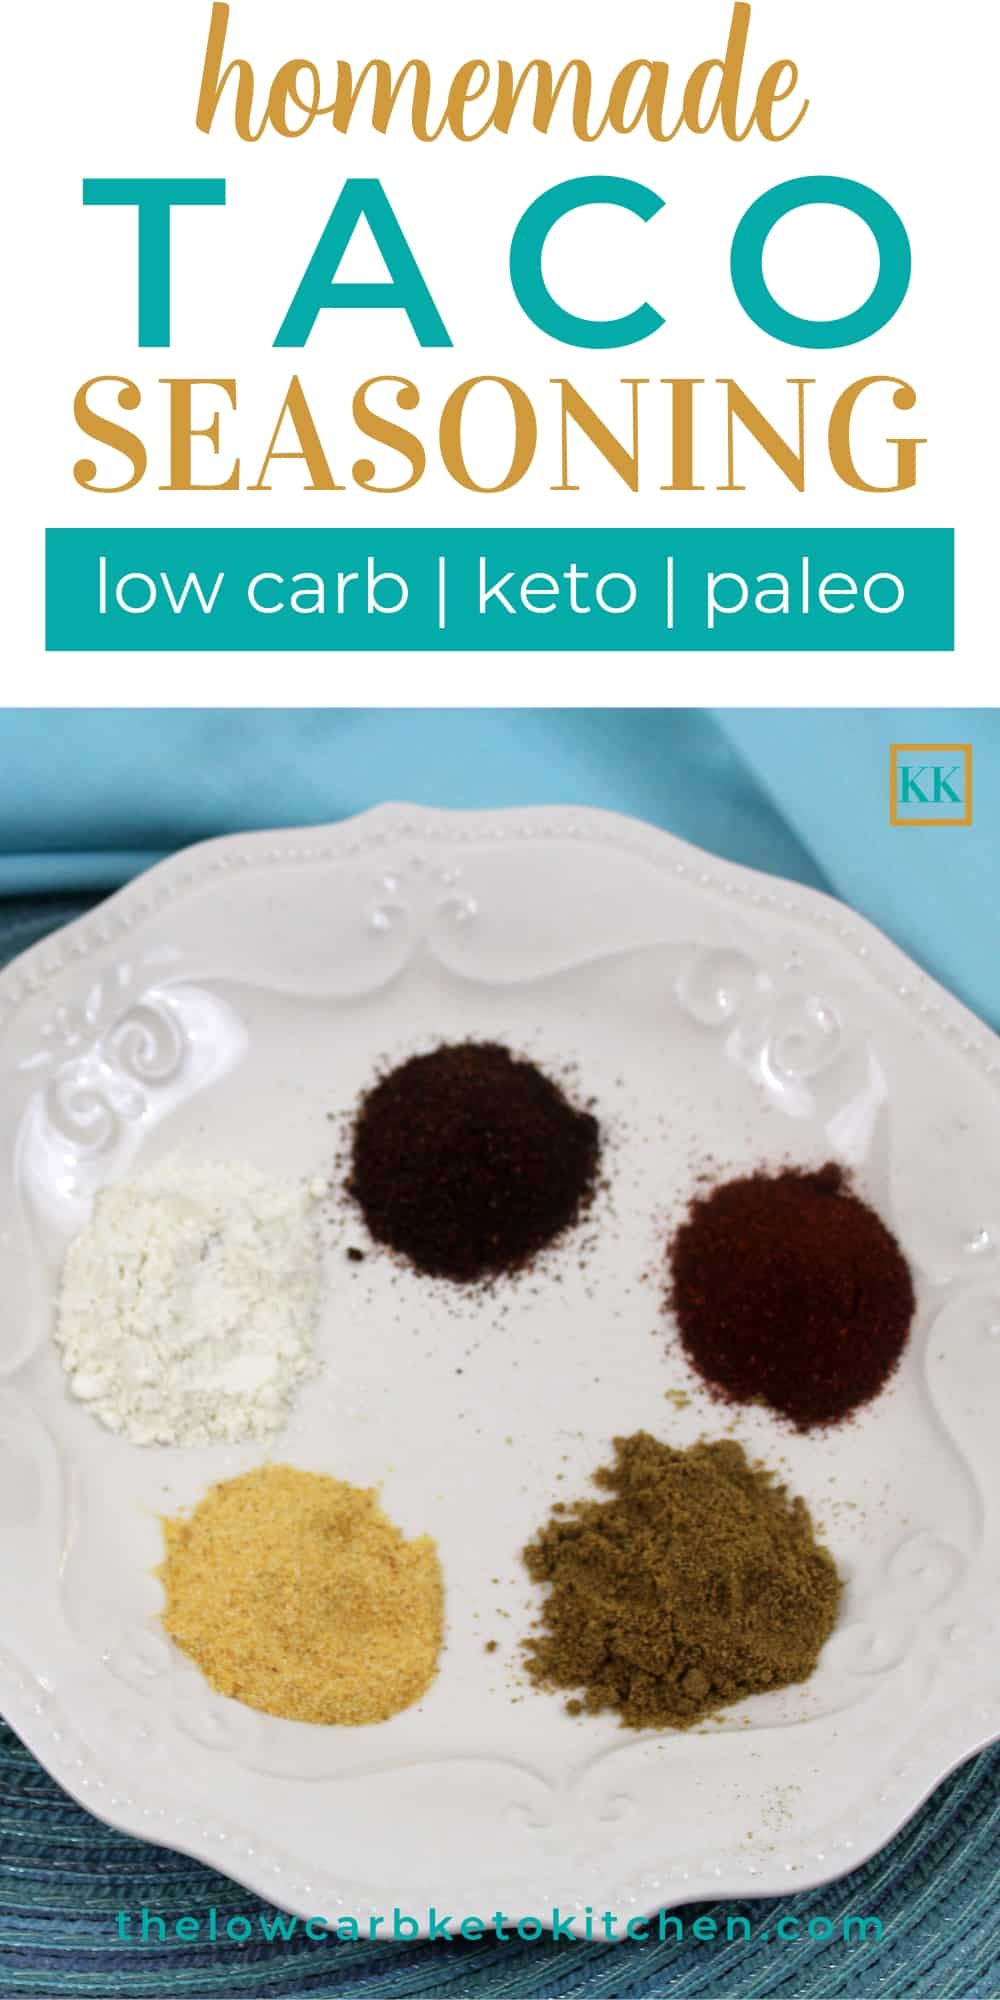 Homemade Keto Taco Seasoning